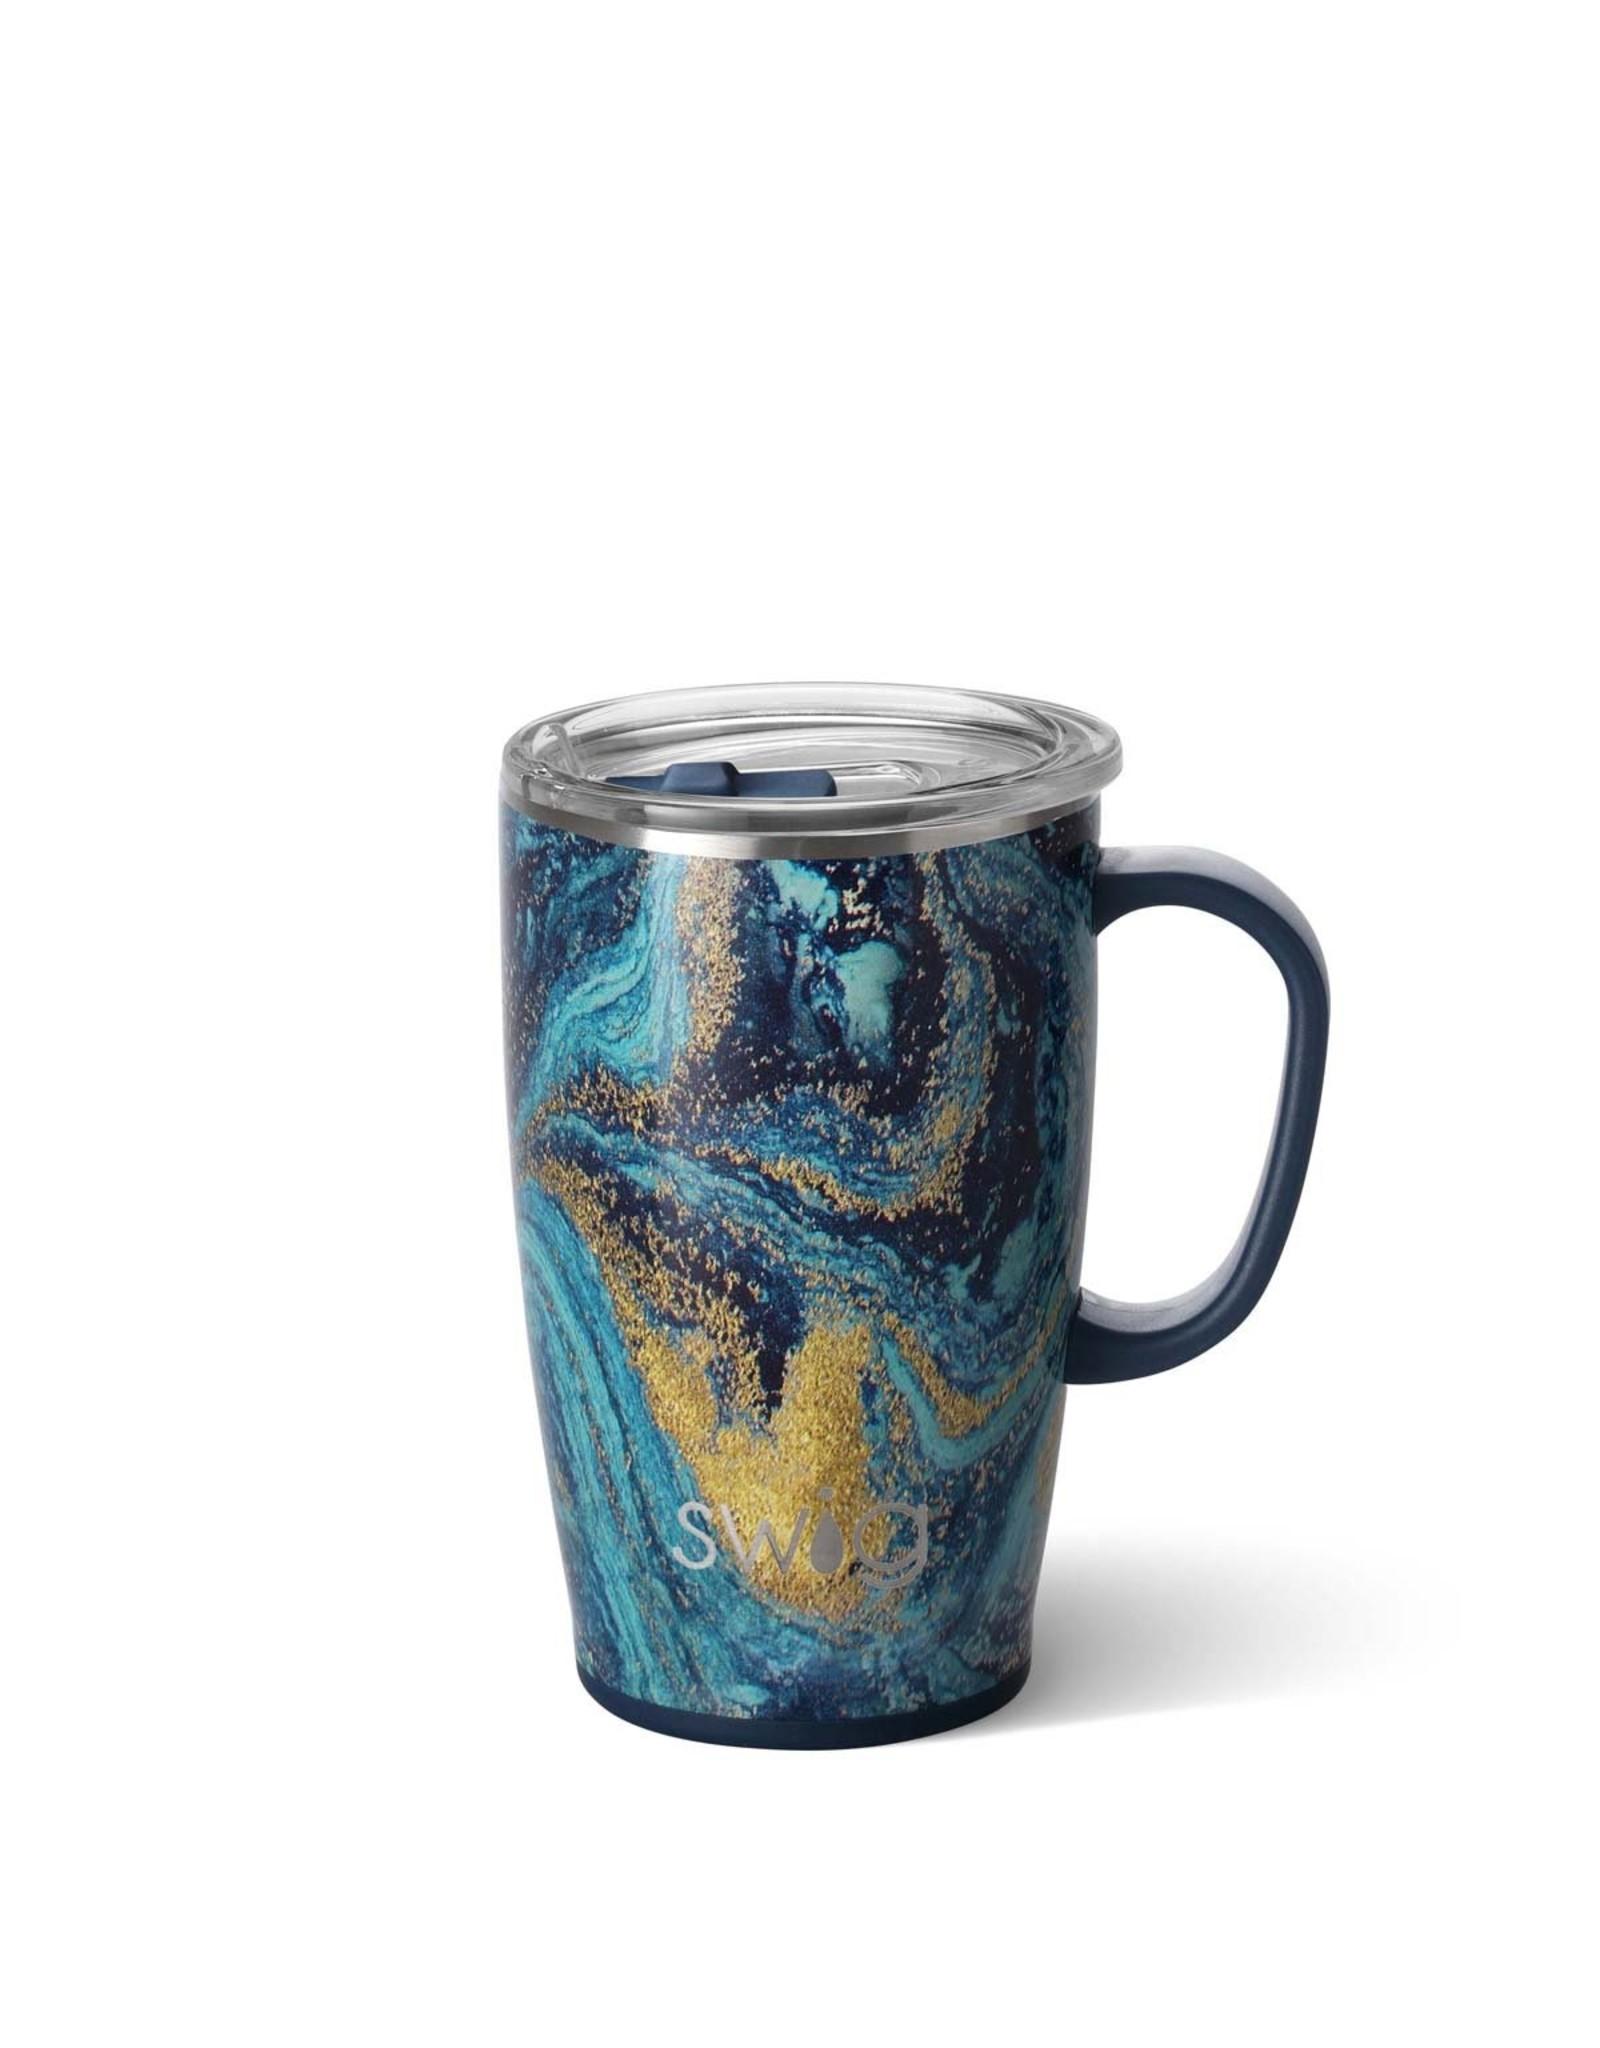 Swig 18 oz Mug - Starry Night